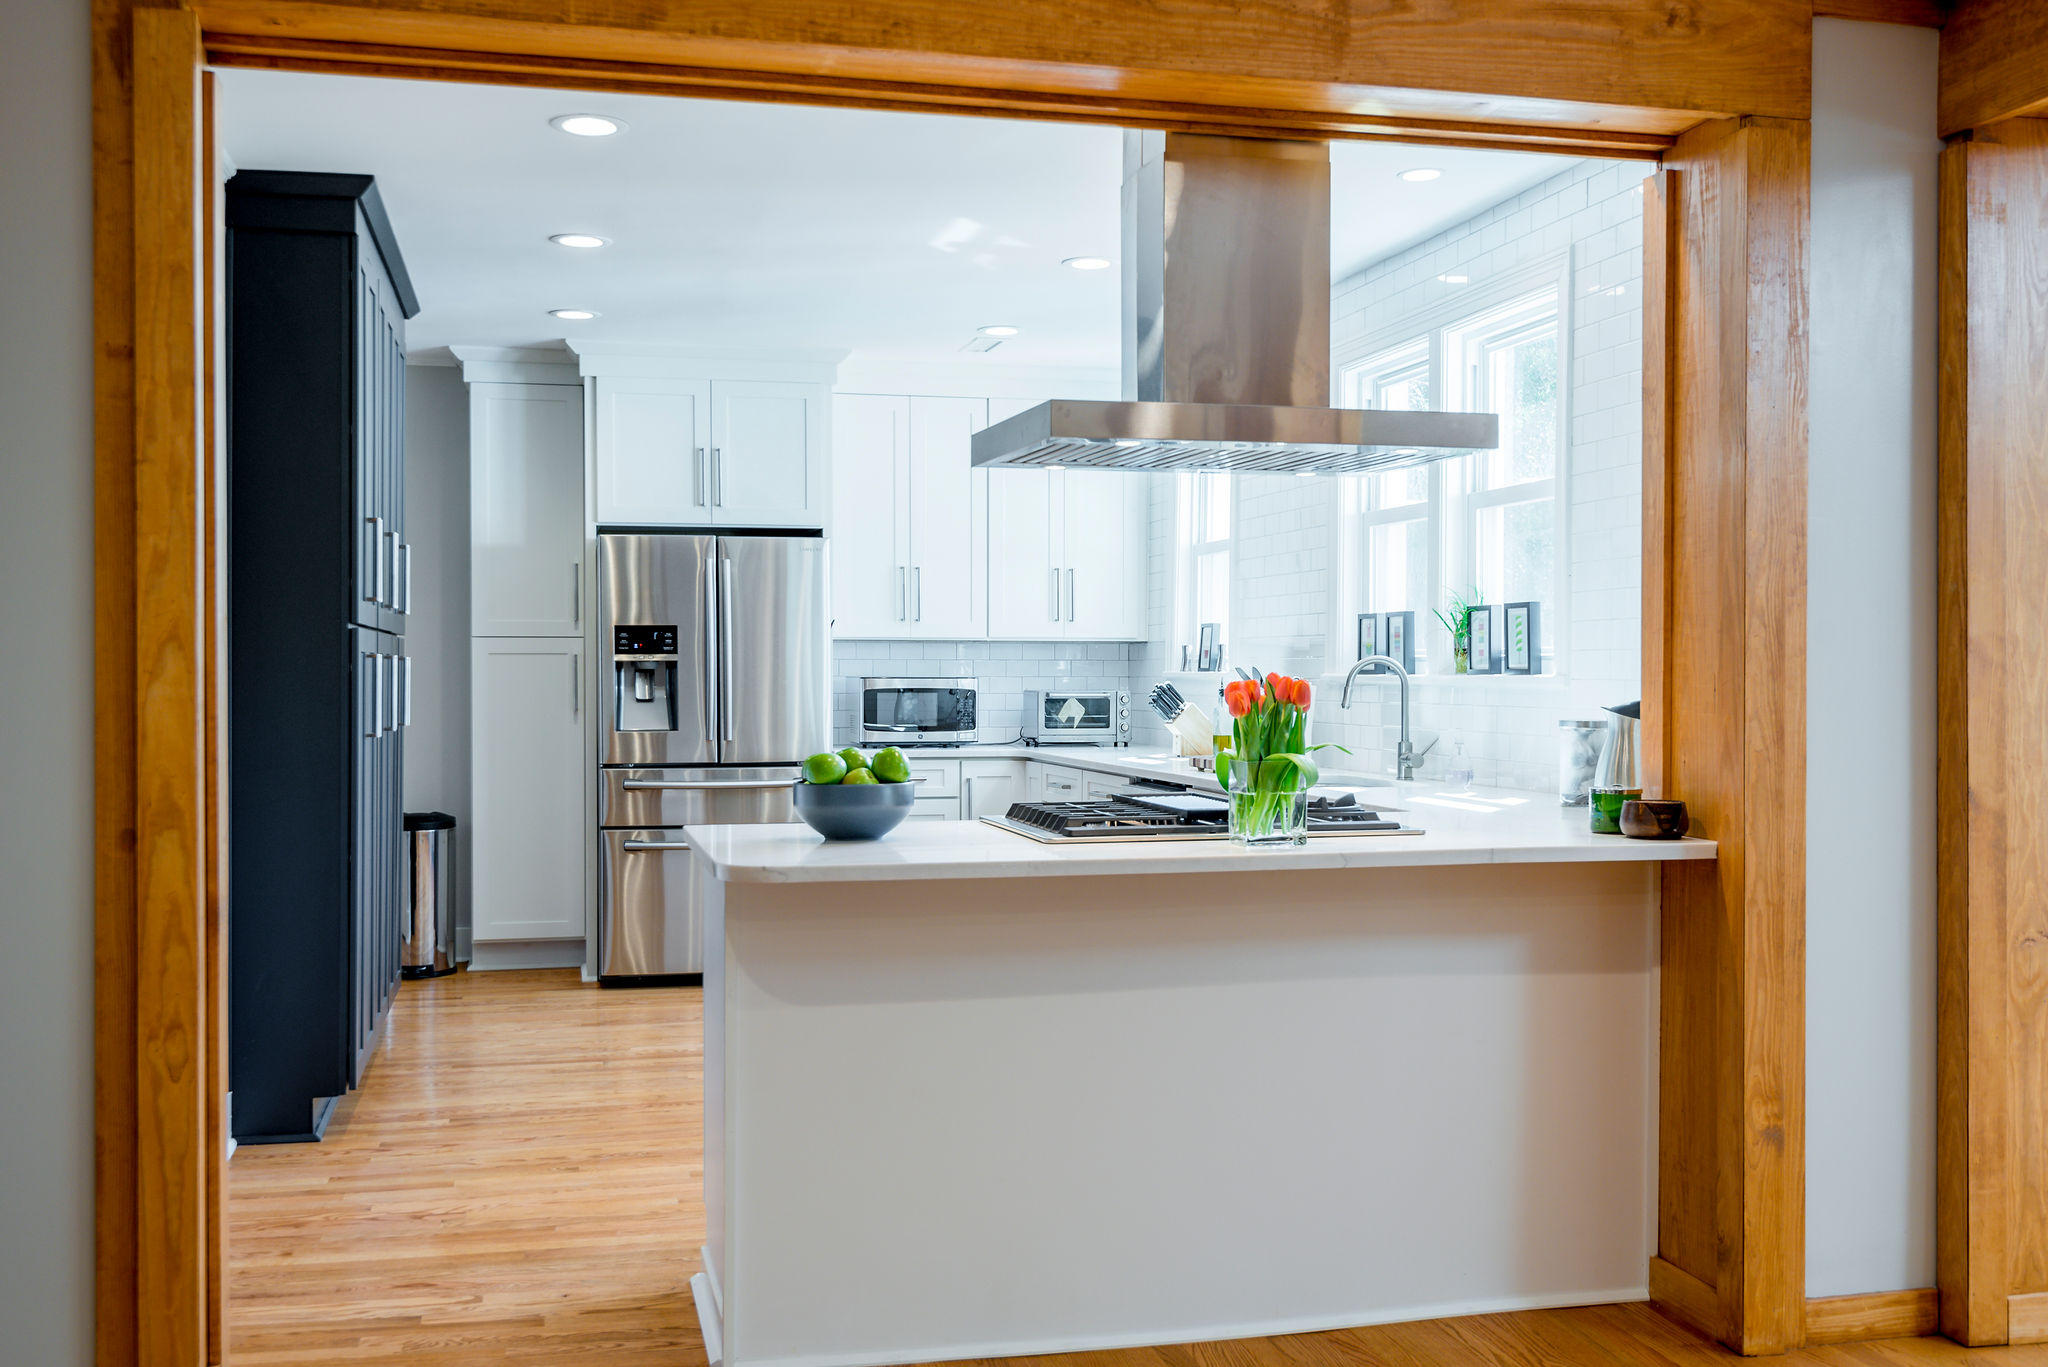 Sylvan Shores Homes For Sale - 450 Polony, Charleston, SC - 45